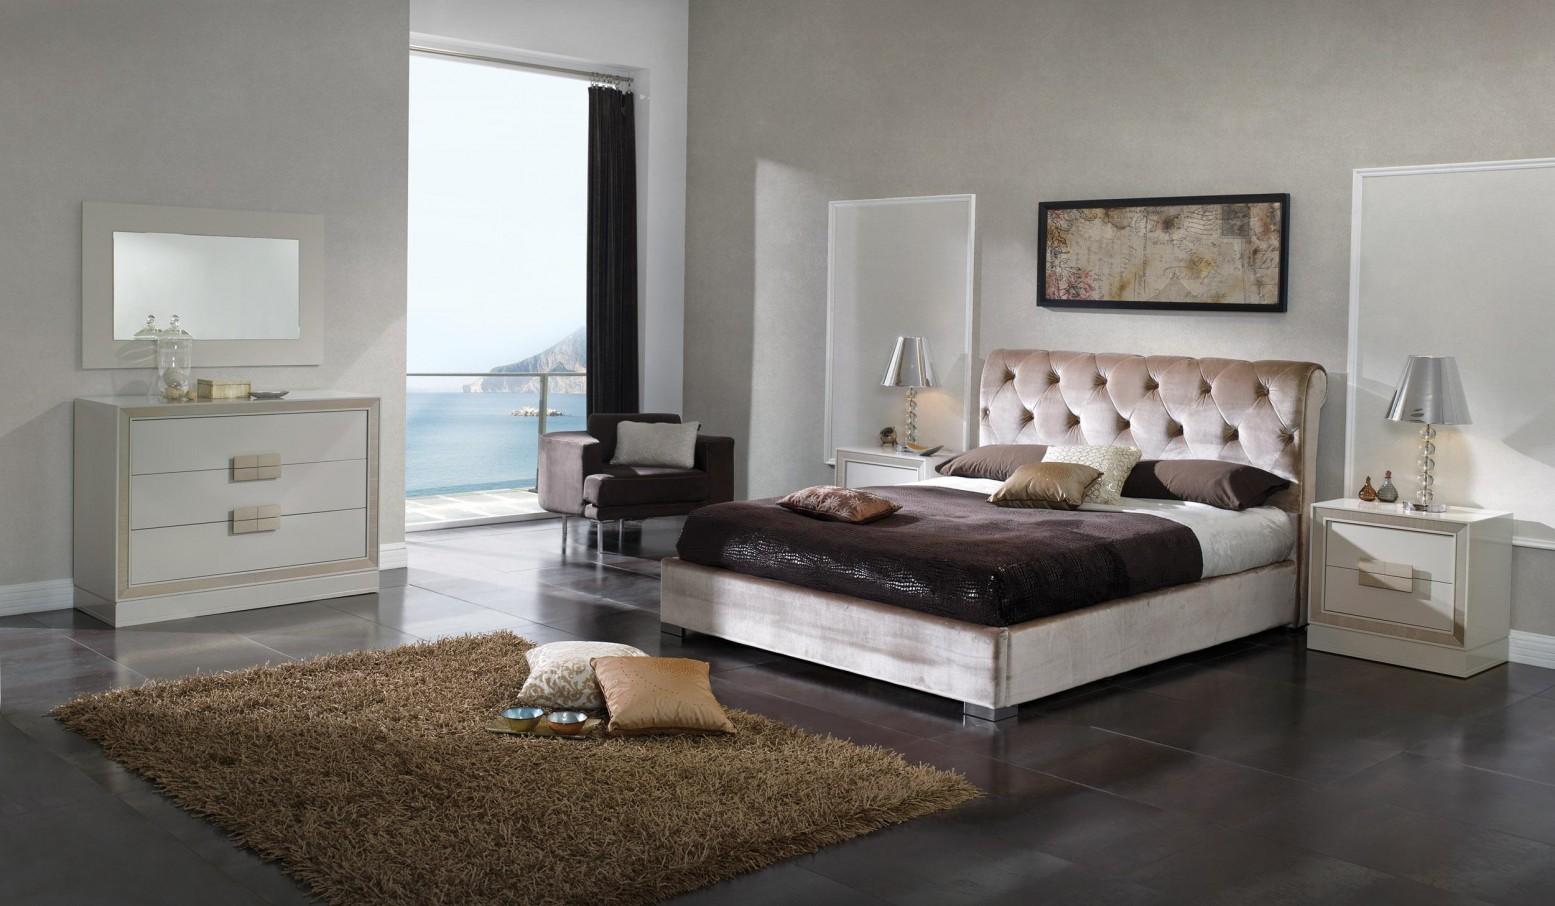 Miriam 3 Piece King Size Storage Bedroom Set Buy Online At Best Price